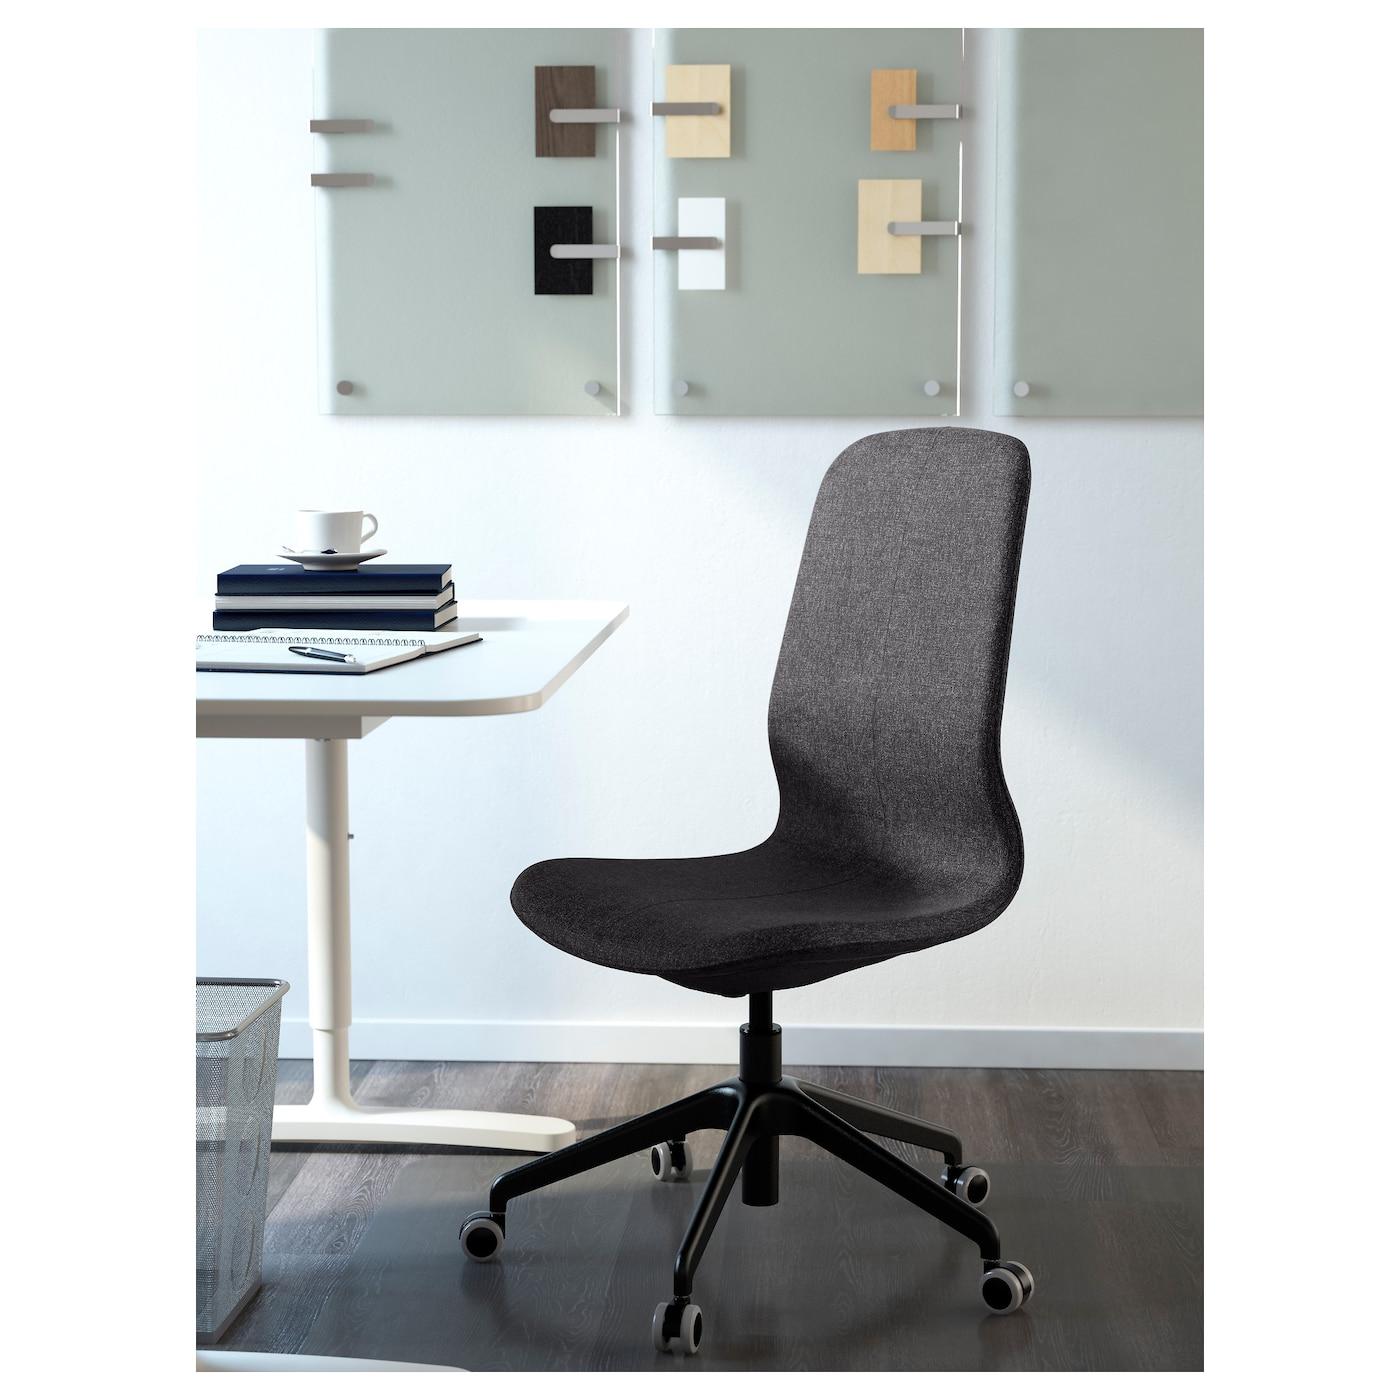 l ngfj ll chaise pivotante gunnared gris fonc noir ikea. Black Bedroom Furniture Sets. Home Design Ideas